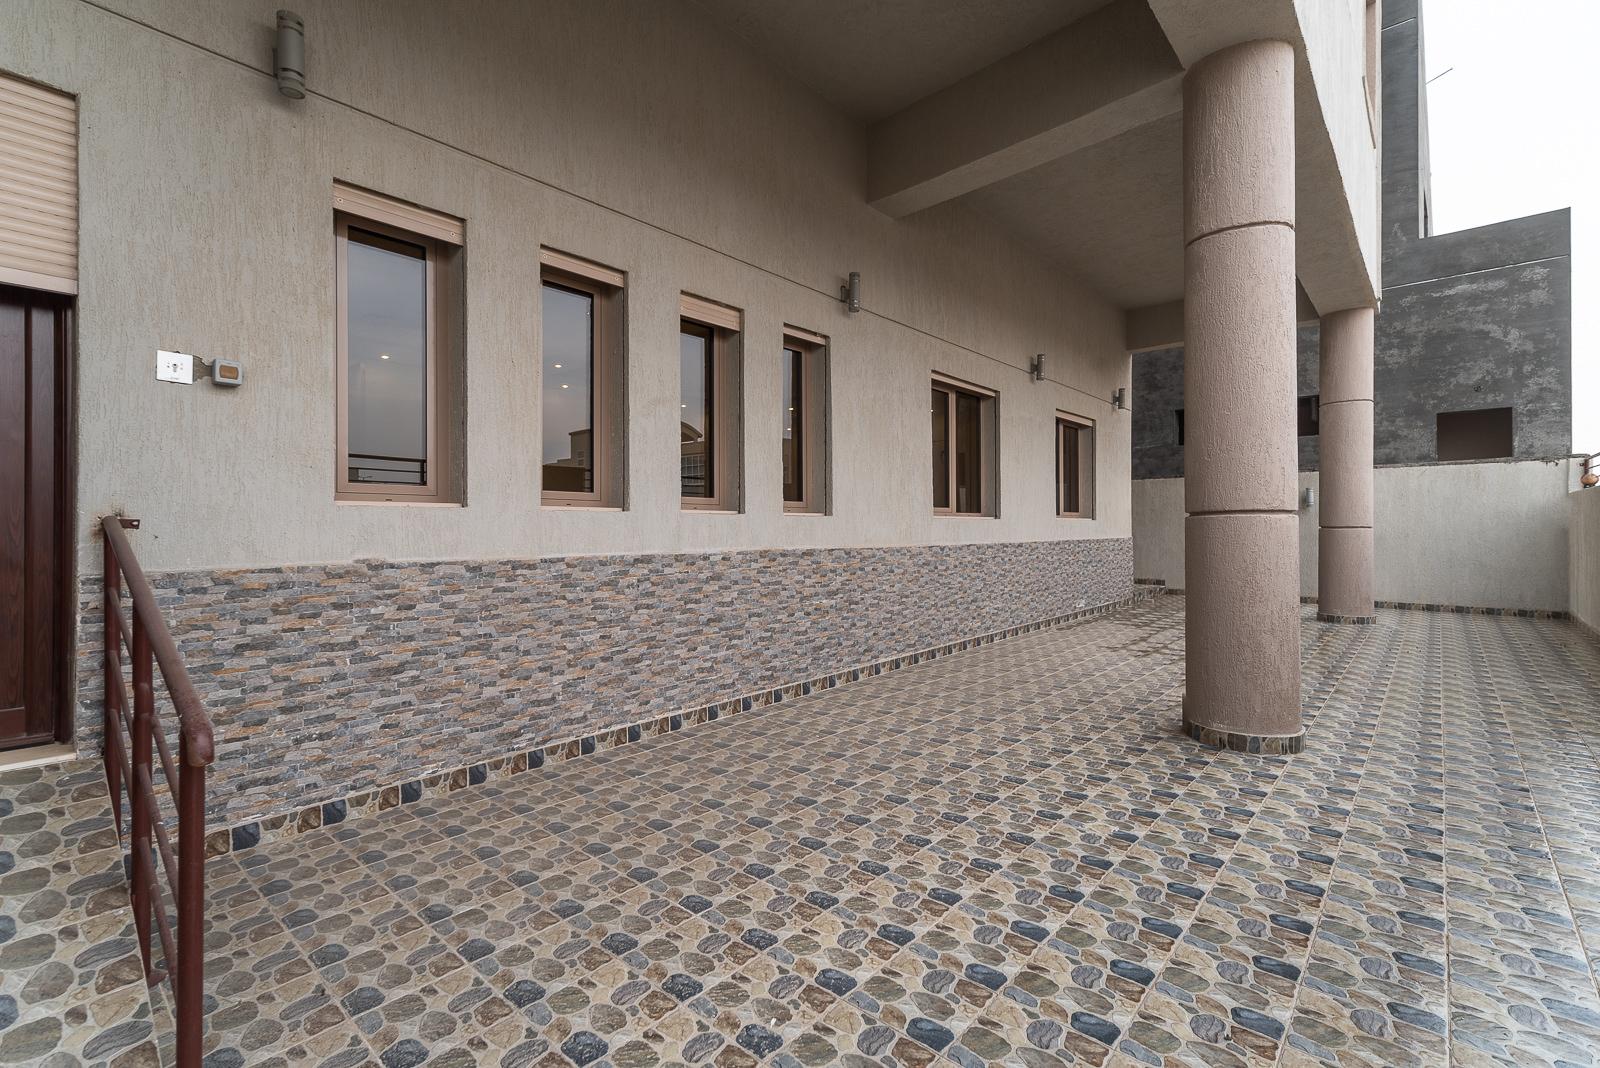 Sabah Al Ahmad – new, spacious villa suitable for nurseries